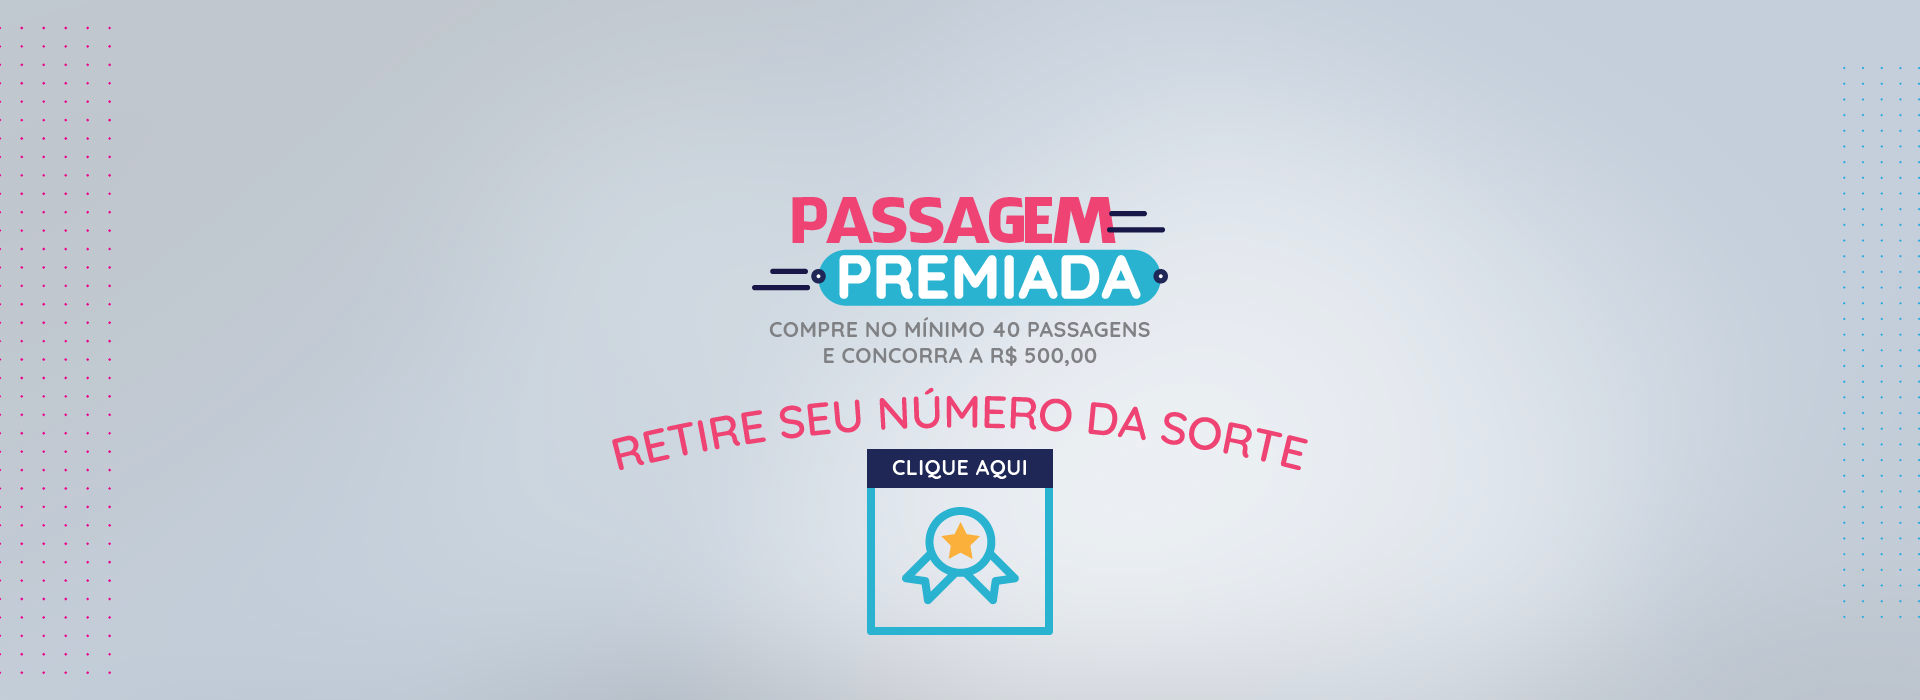 21_Slider-site_1920-x-700px_Passagem-Premiada-01